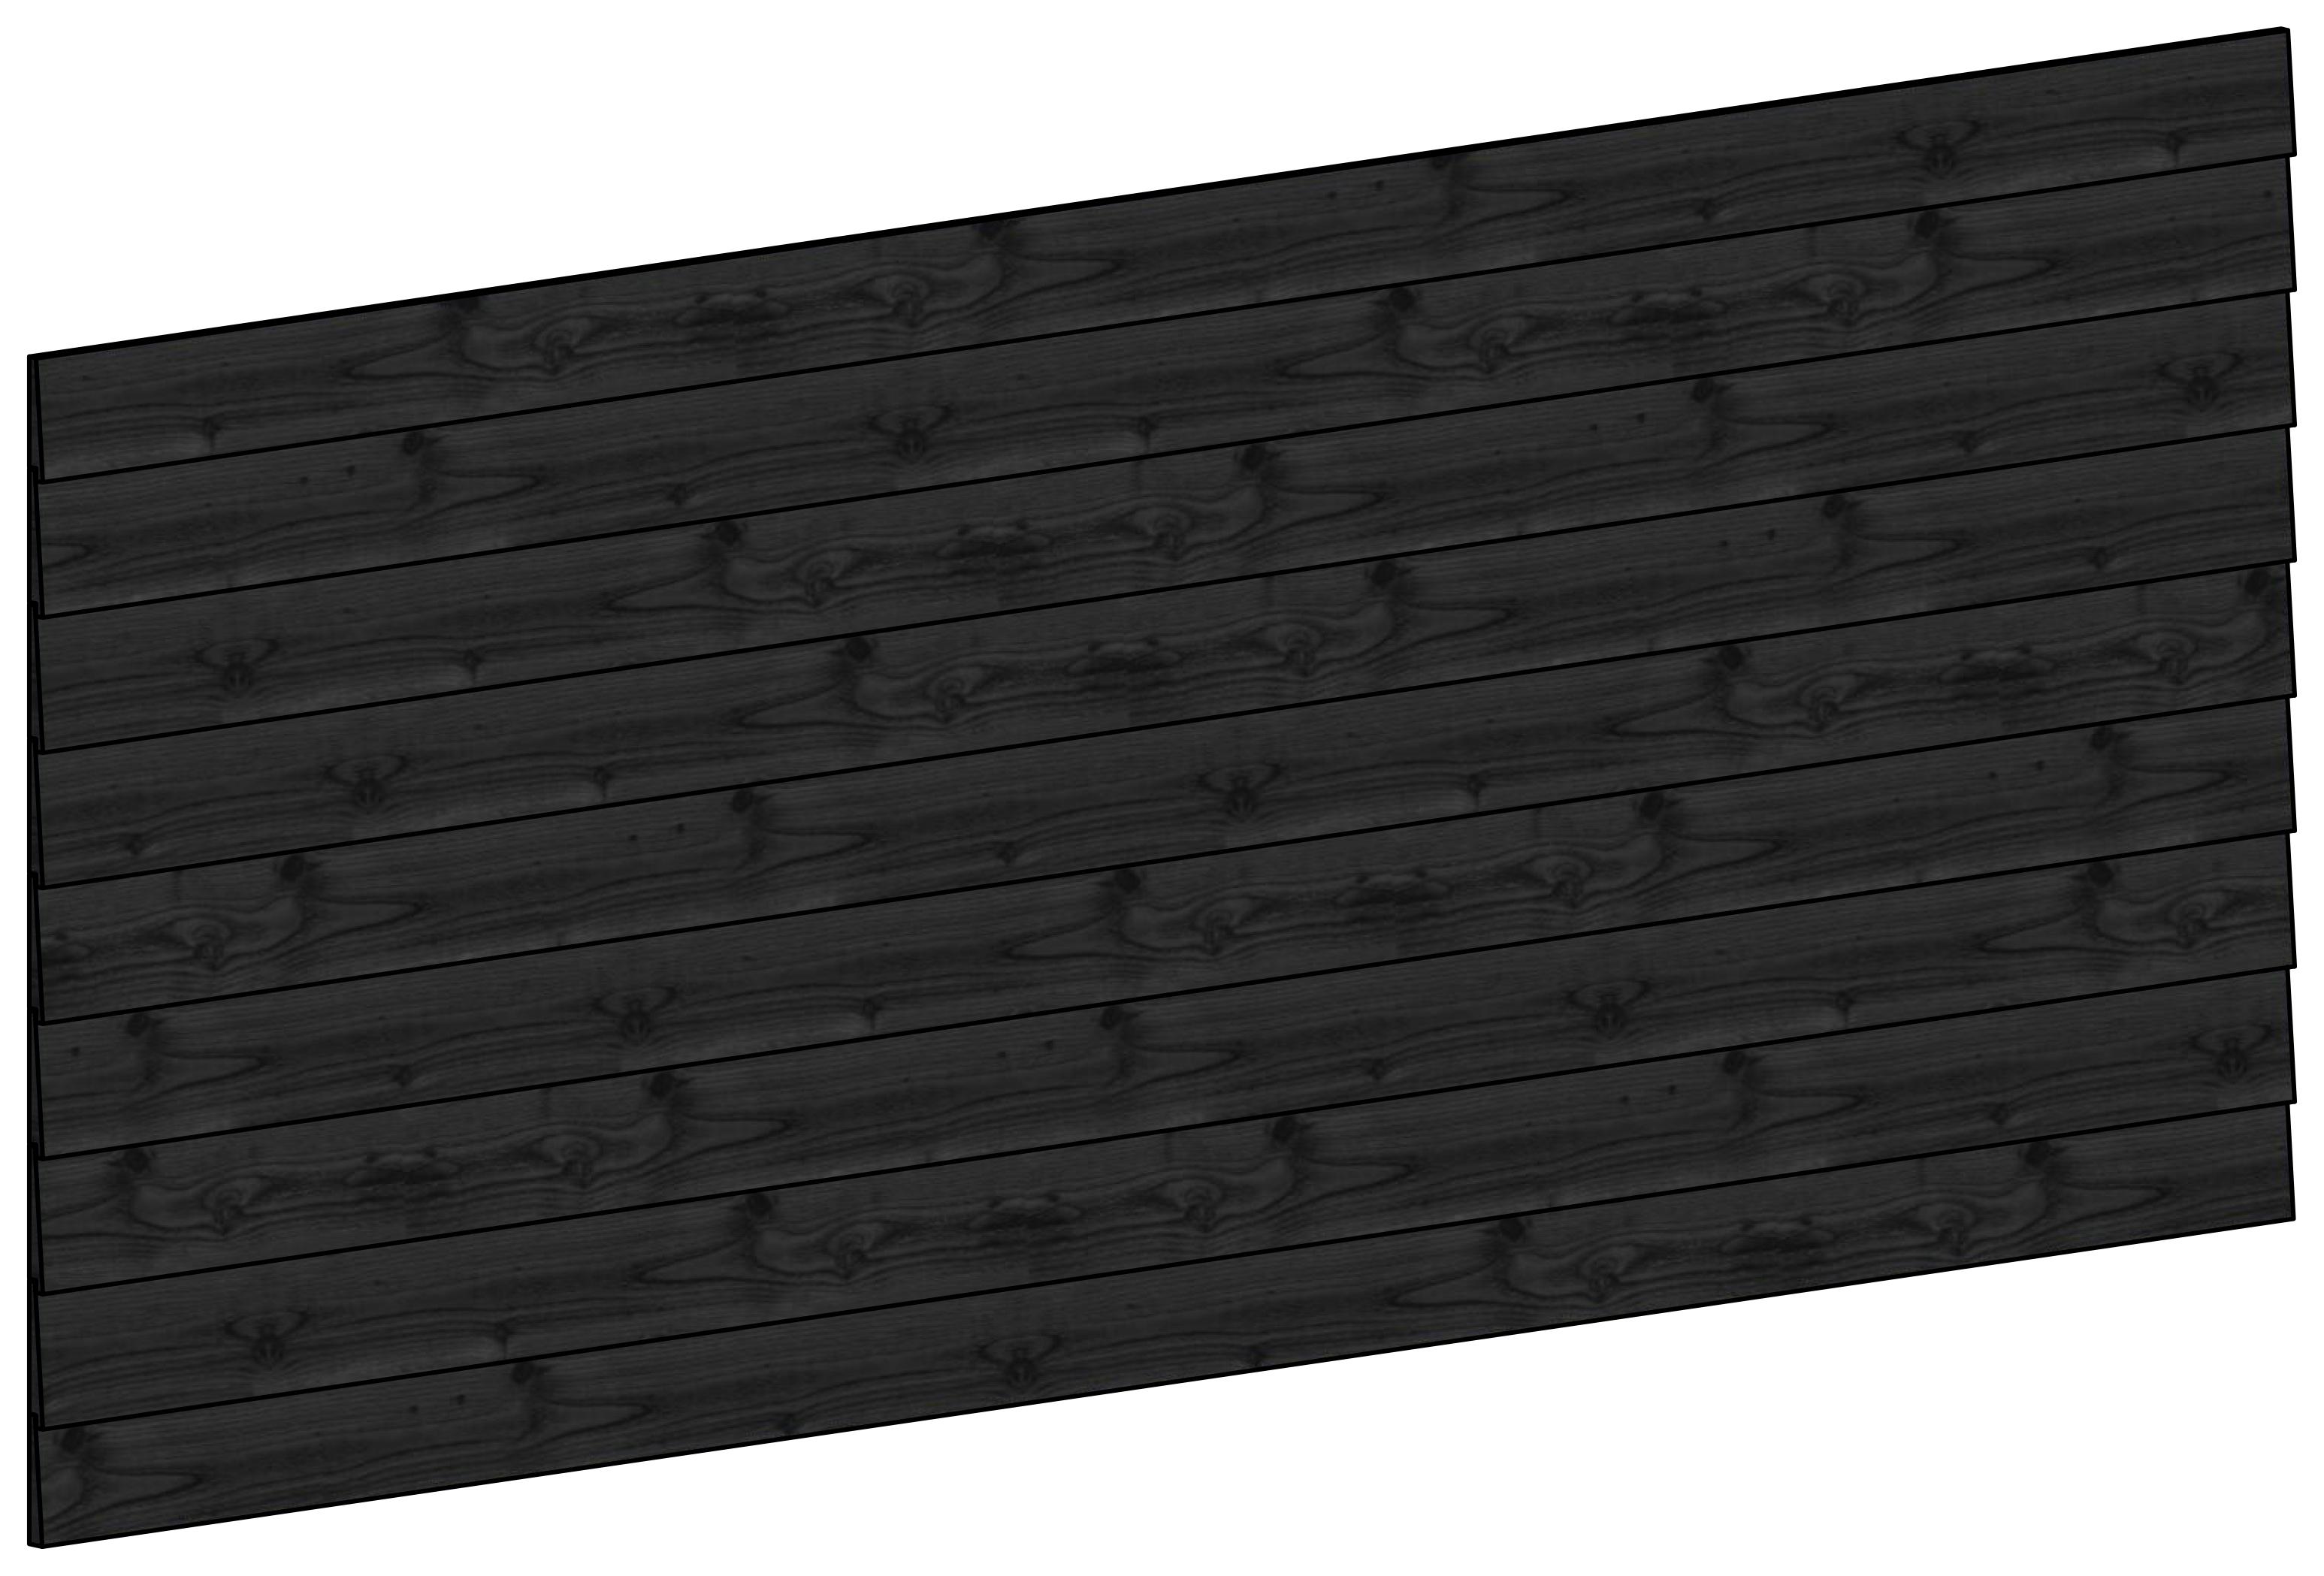 Trendhout | Wandmodule F potdekselplanken zwart | 276x117 cm